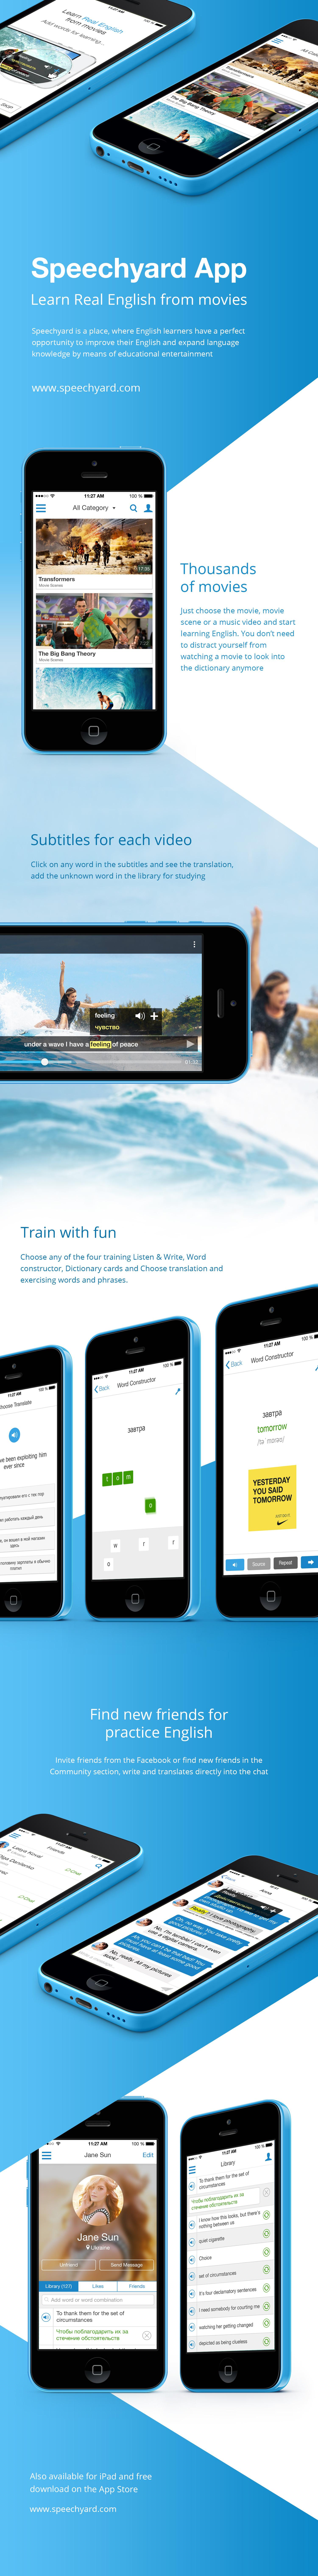 Speechyard App